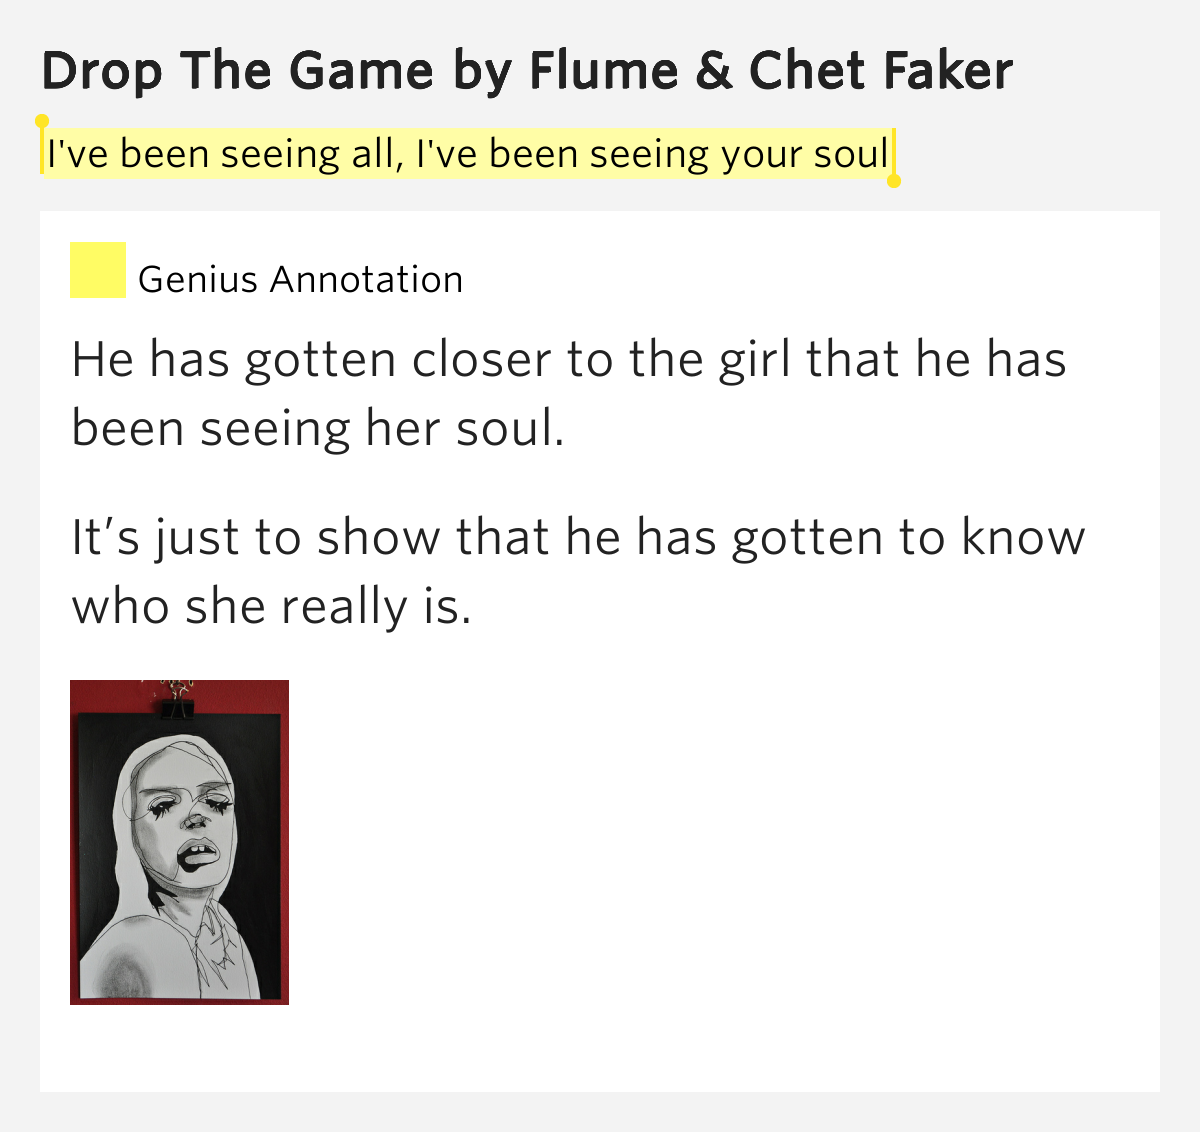 CHET FAKER & FLUME : Drop The Game lyrics